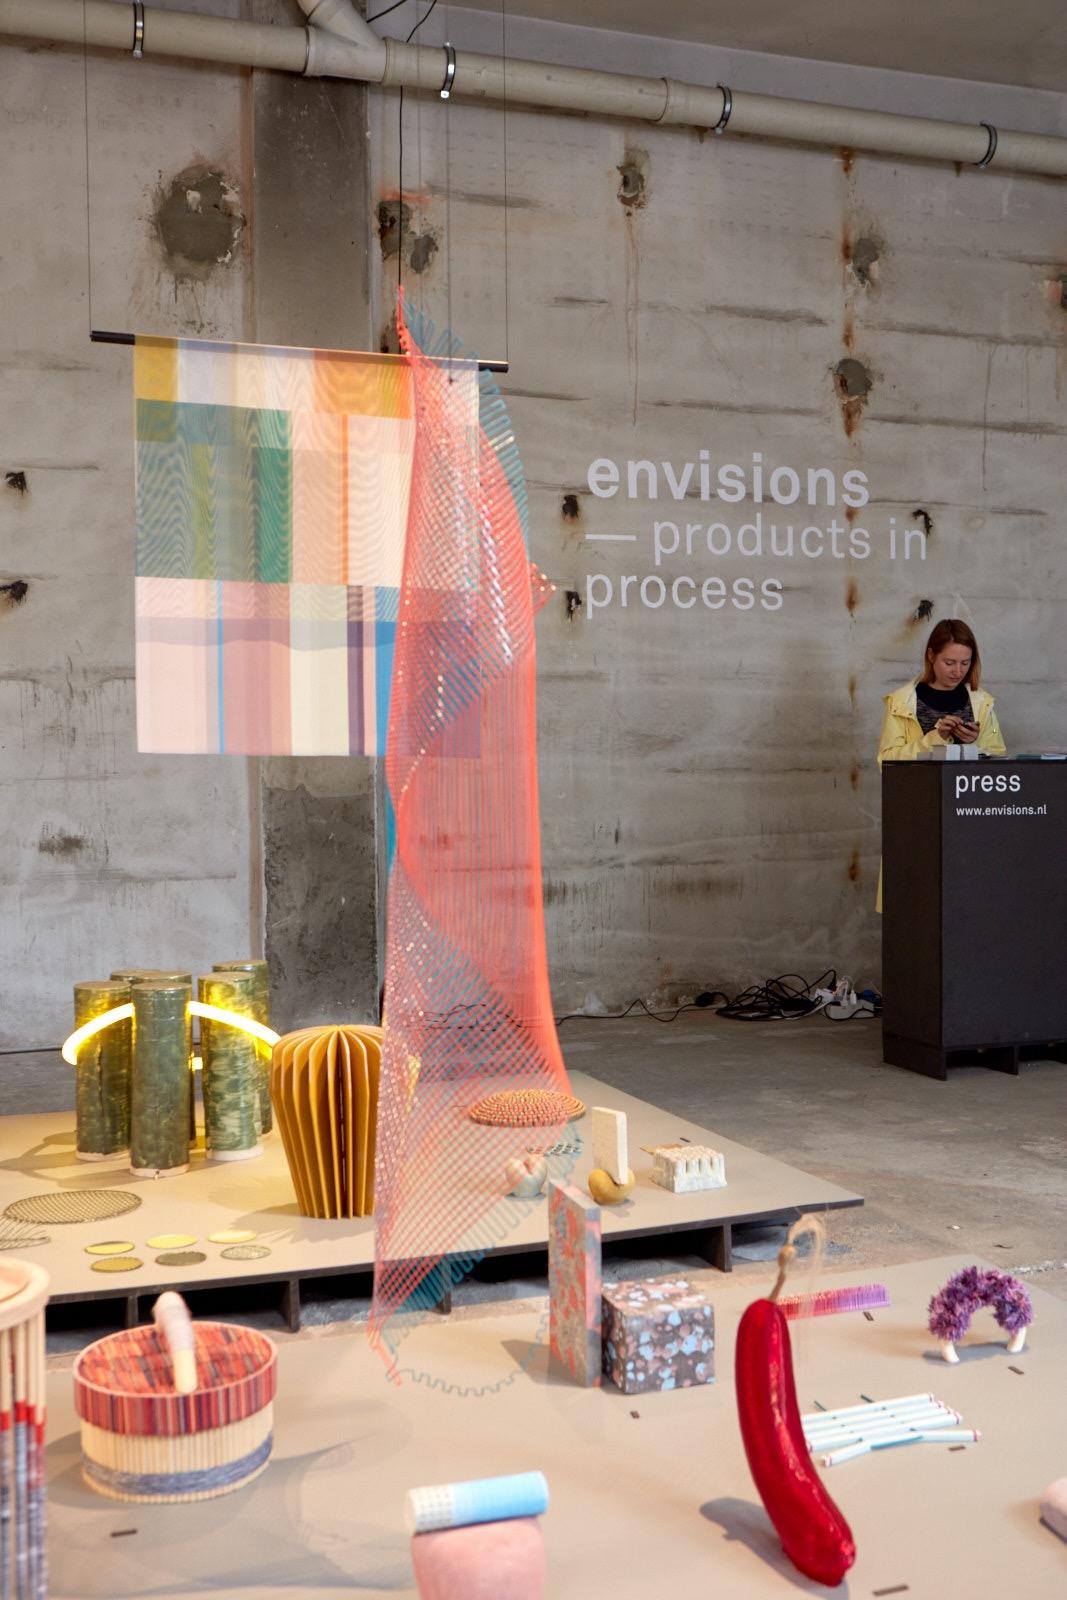 Envision -  Products in Process  installation at Ventura Lambrate, Milan 2016. Photo: Ronald Smits.